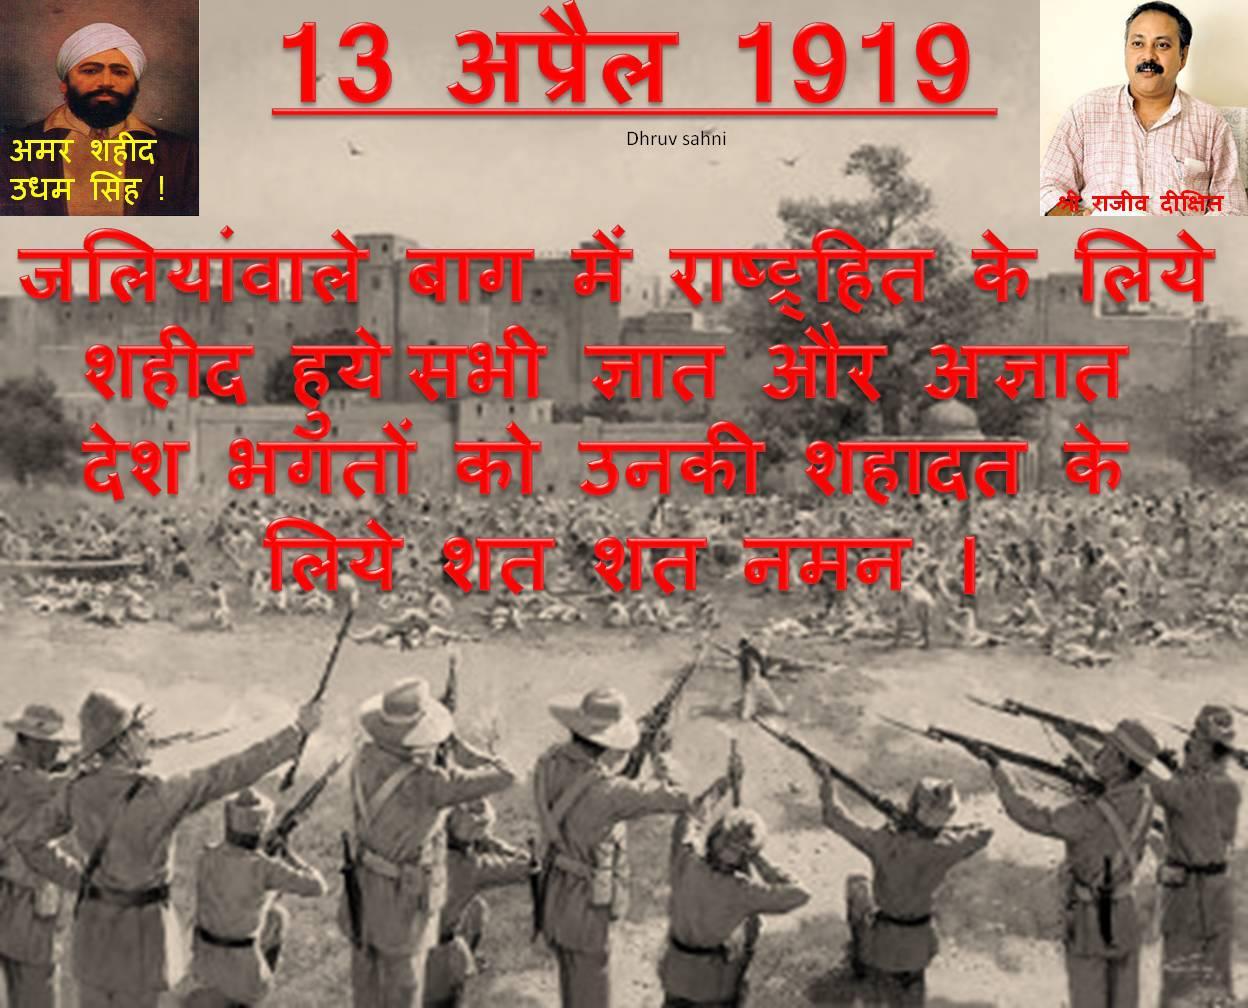 Jallianwala Bagh massacre - April 13 1919